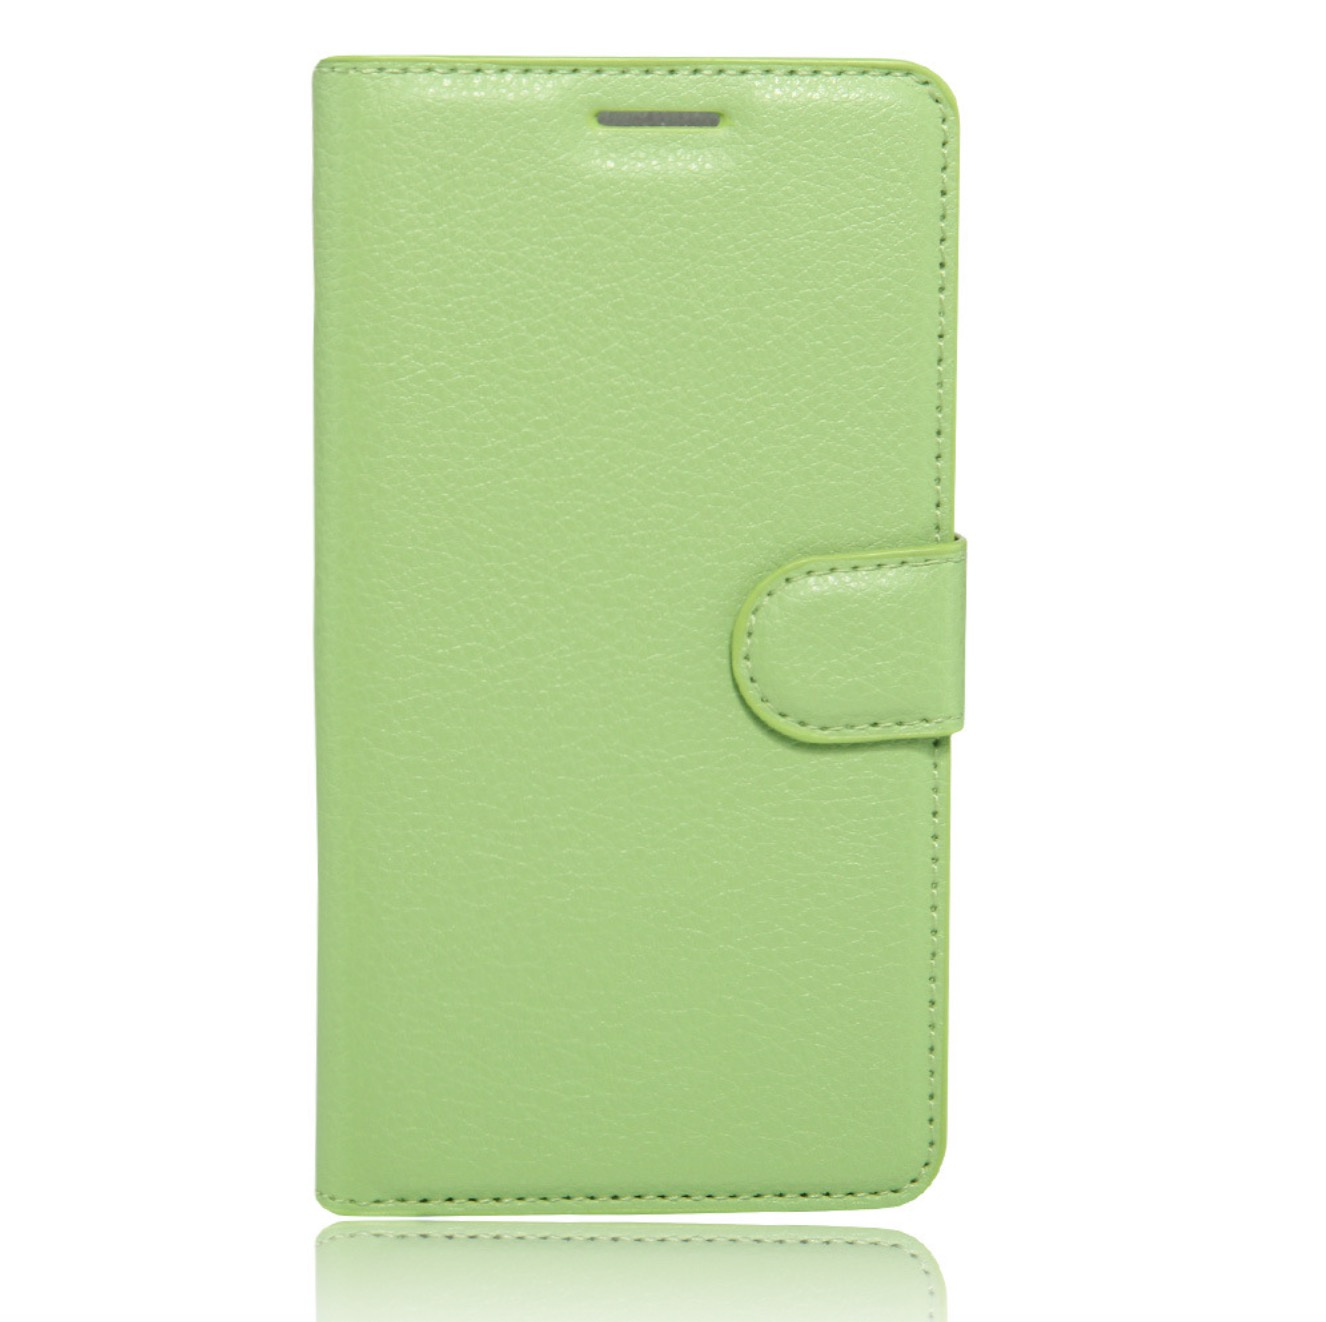 "Чехол-книжка MyPads для Sony Xperia XA / XA Dual 5.0"" (F3113/ F3112 / F3115 /E6533) с мульти-подставкой застёжкой и визитницей зеленый"